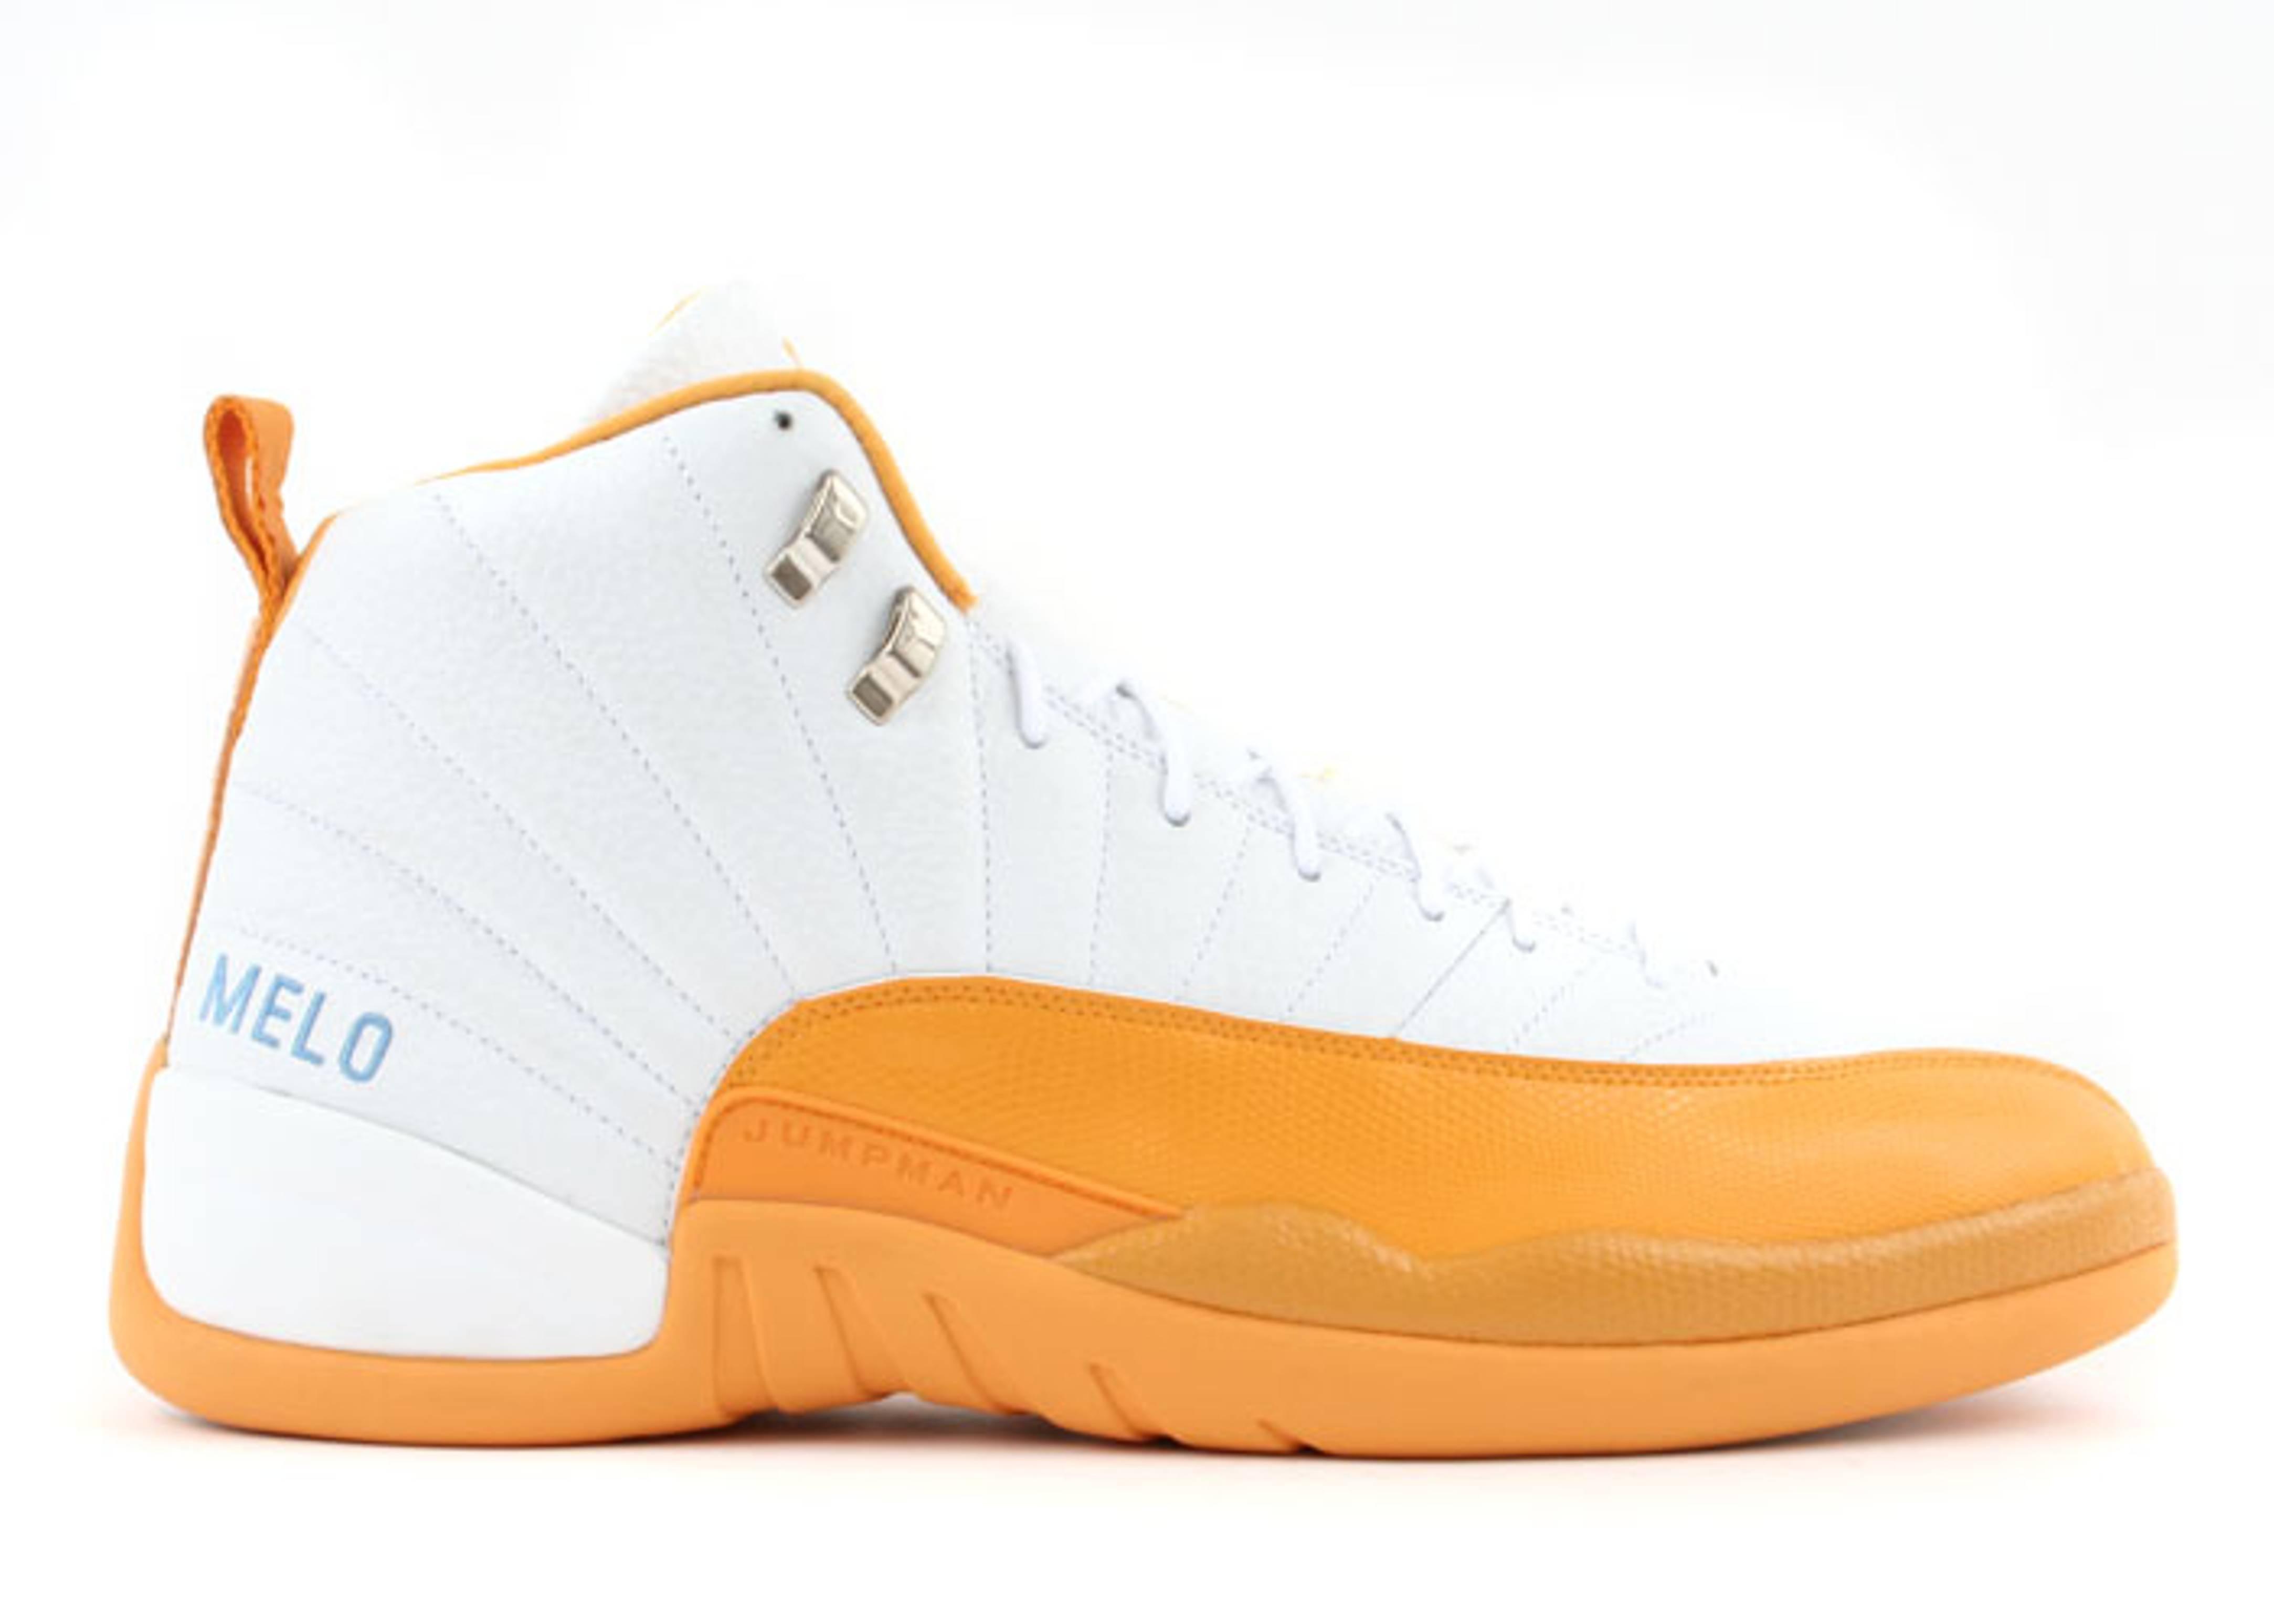 separation shoes 98505 6dbe0 Air Jordan 12 Retro